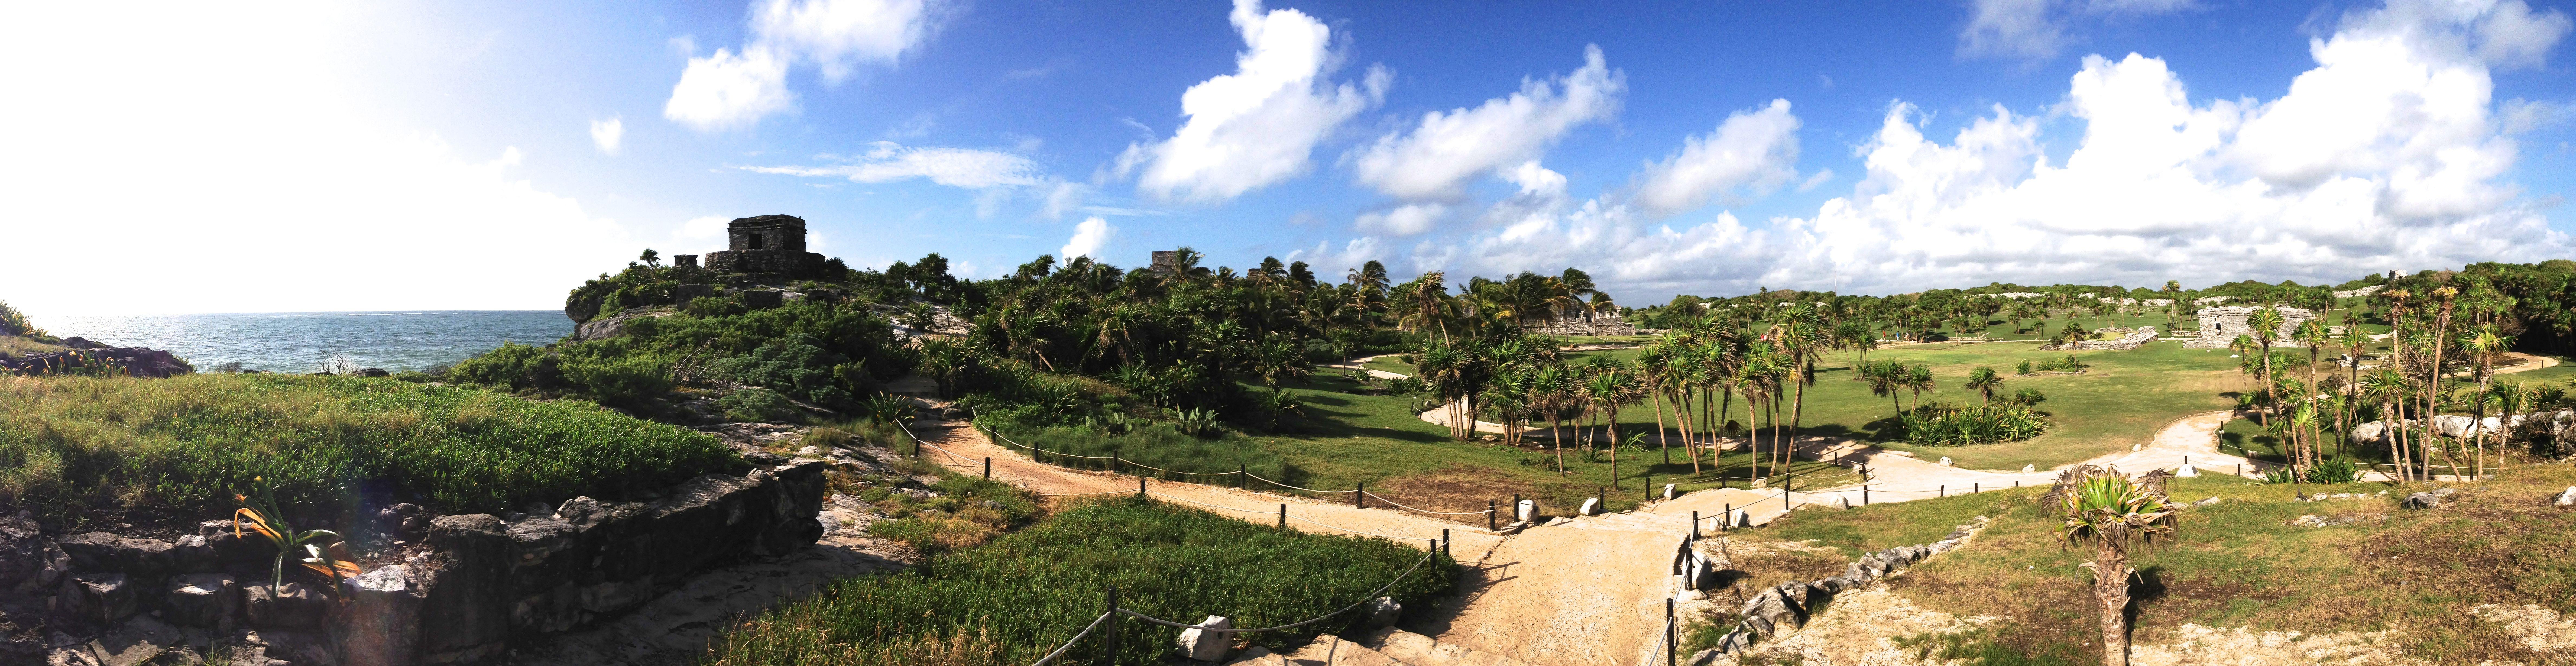 panorama of tulum